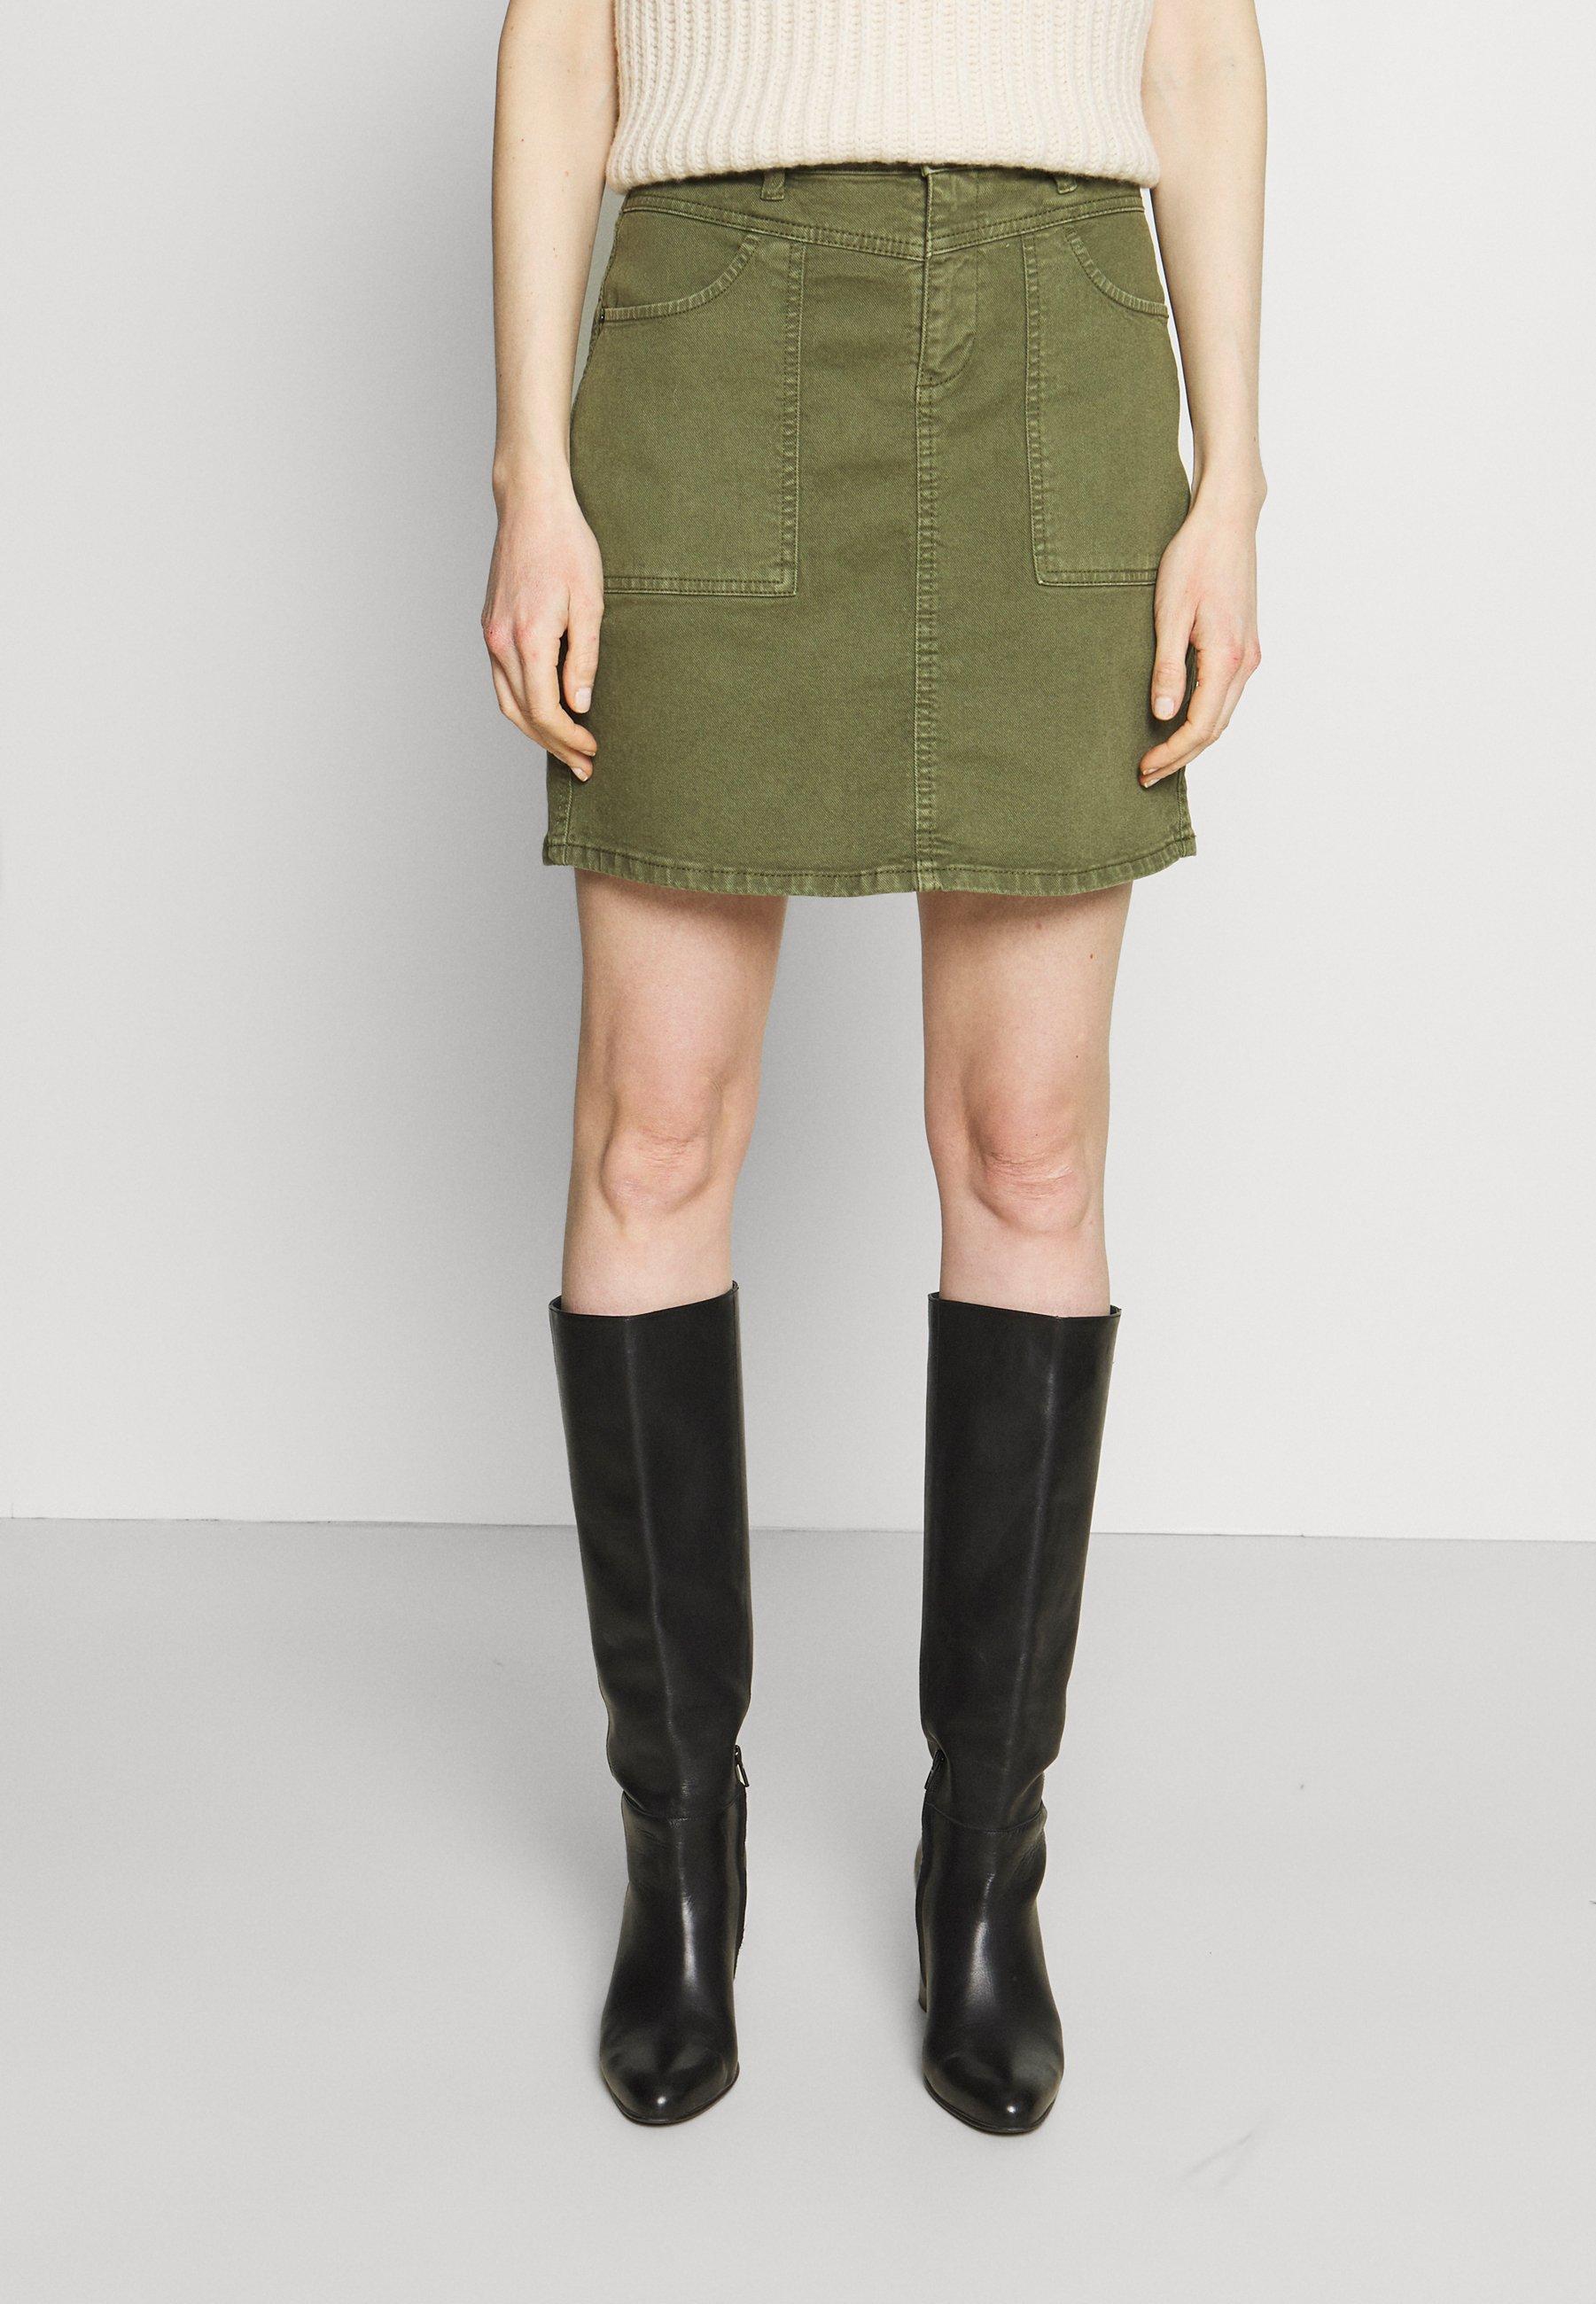 Femme ICON SKIRT - Jupe en jean